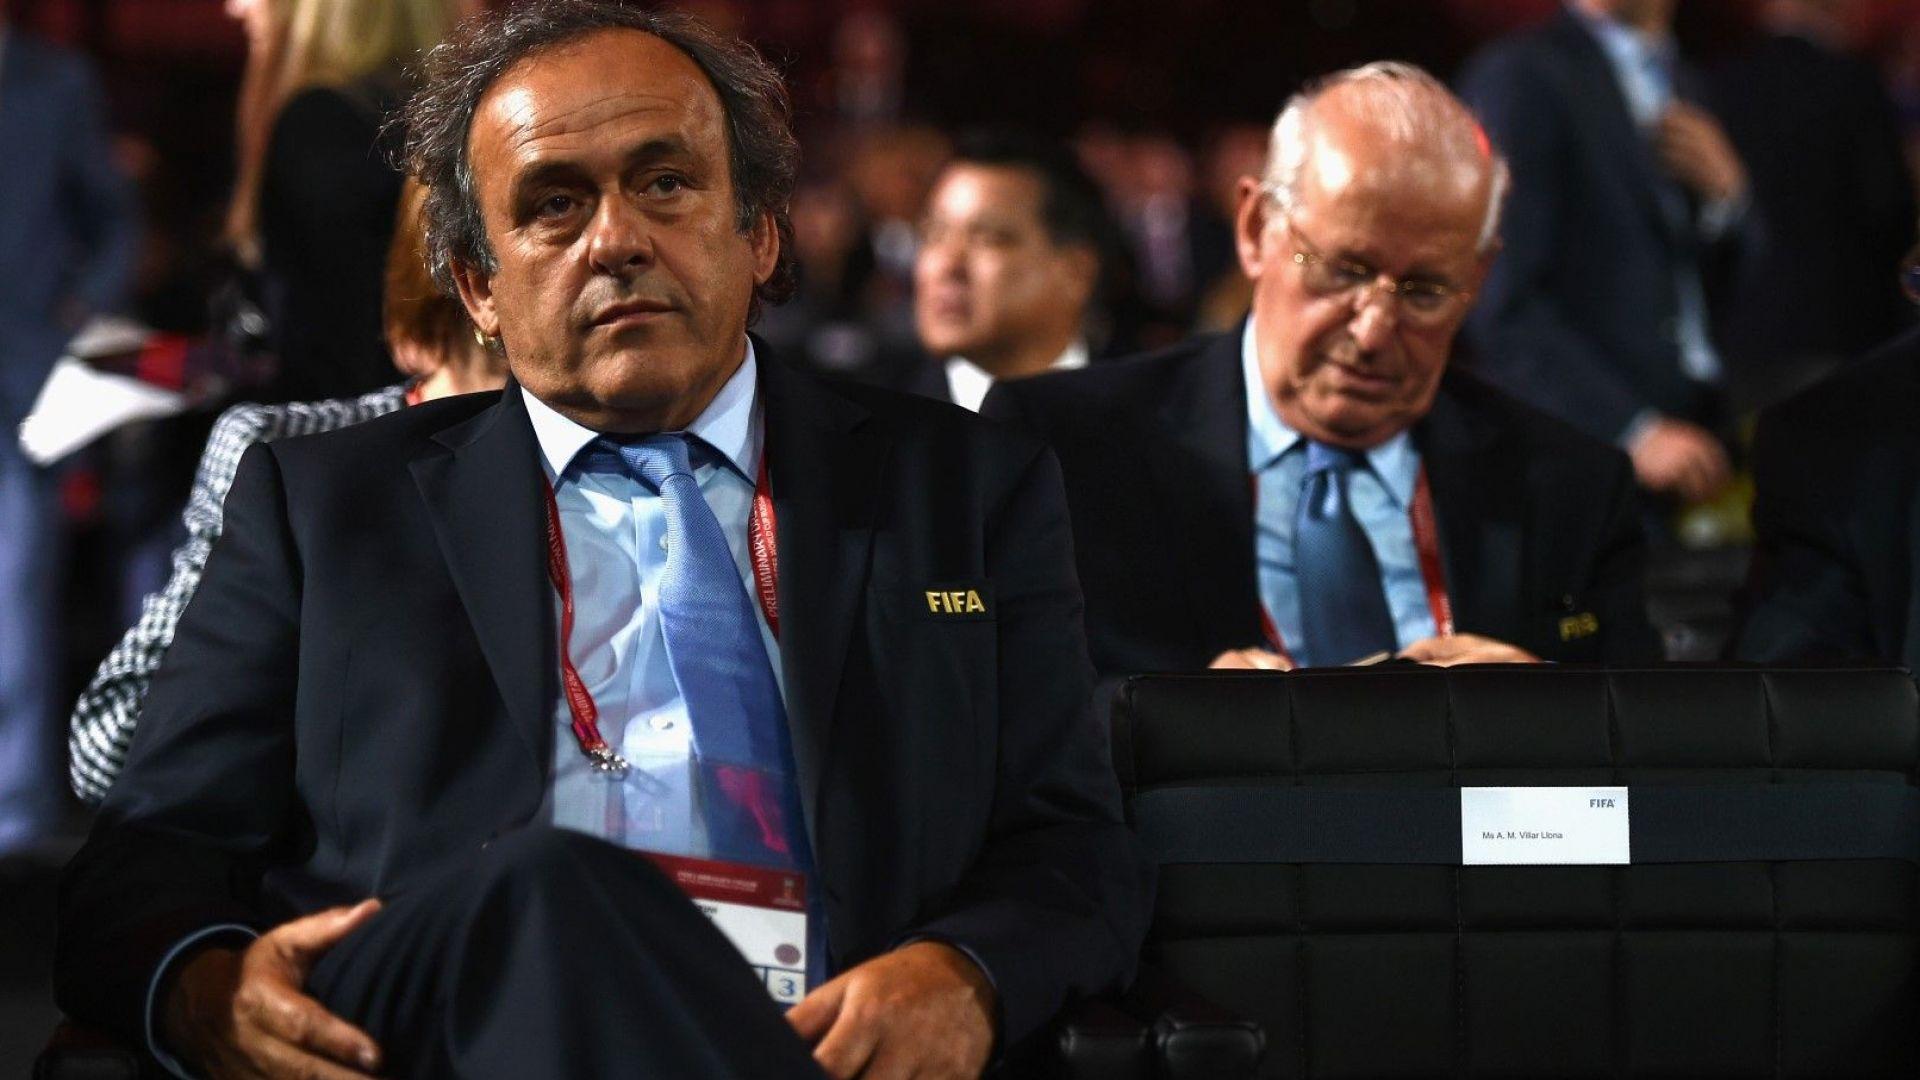 ФИФА съди Блатер и Платини за прибрани 2 милиона швейцарски франка